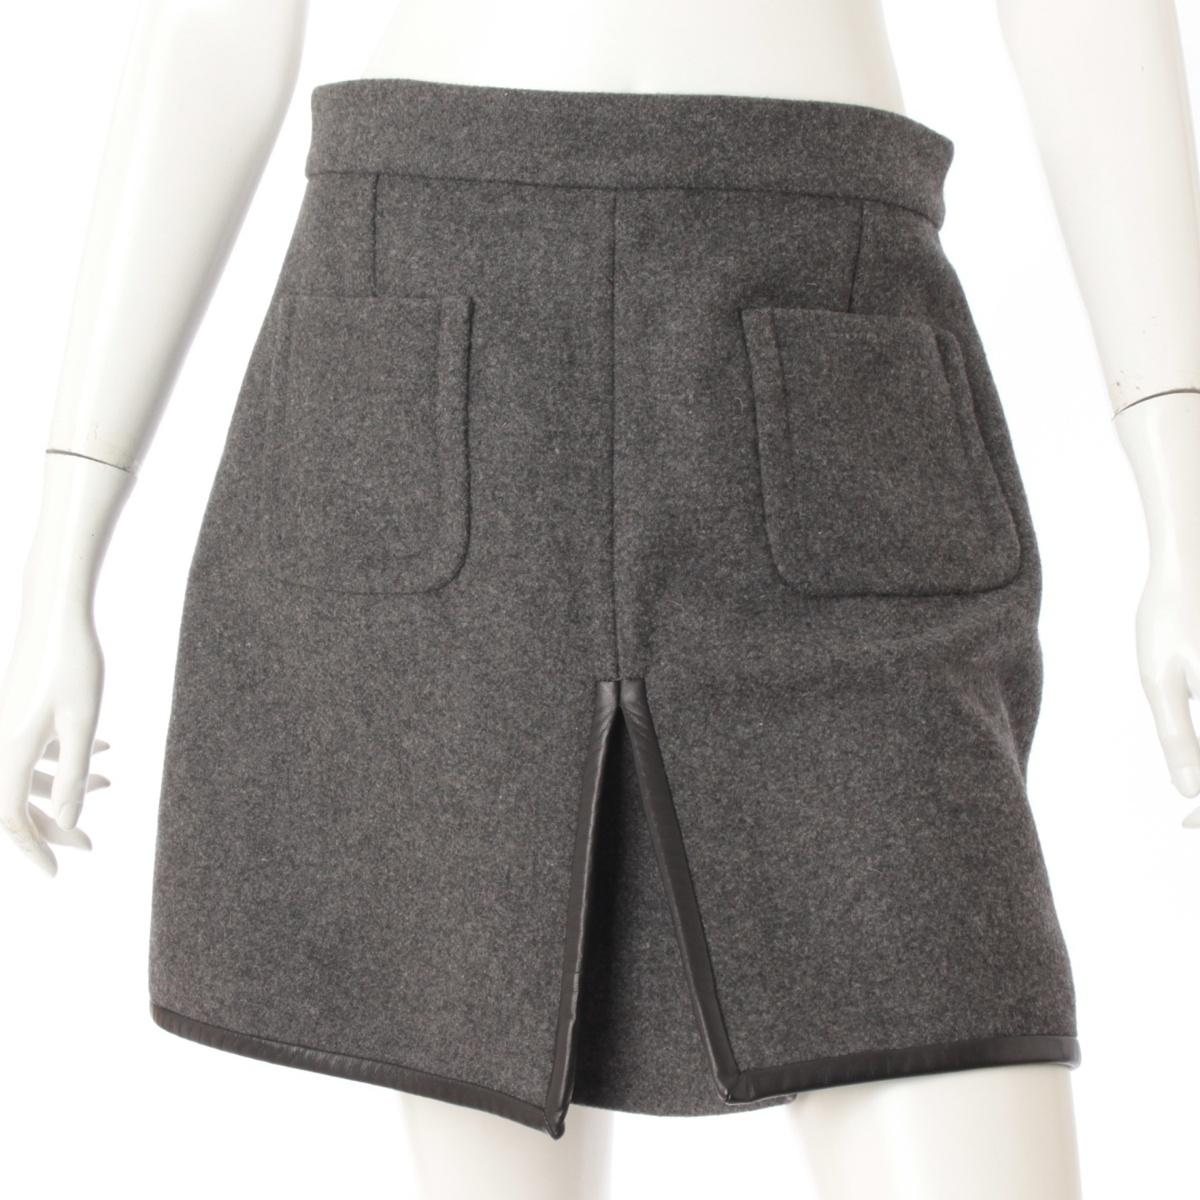 【20%OFFセール】【セリーヌ】Celine ウール パッチポケット スカート グレー 40 【中古】【鑑定済・正規品保証】61132